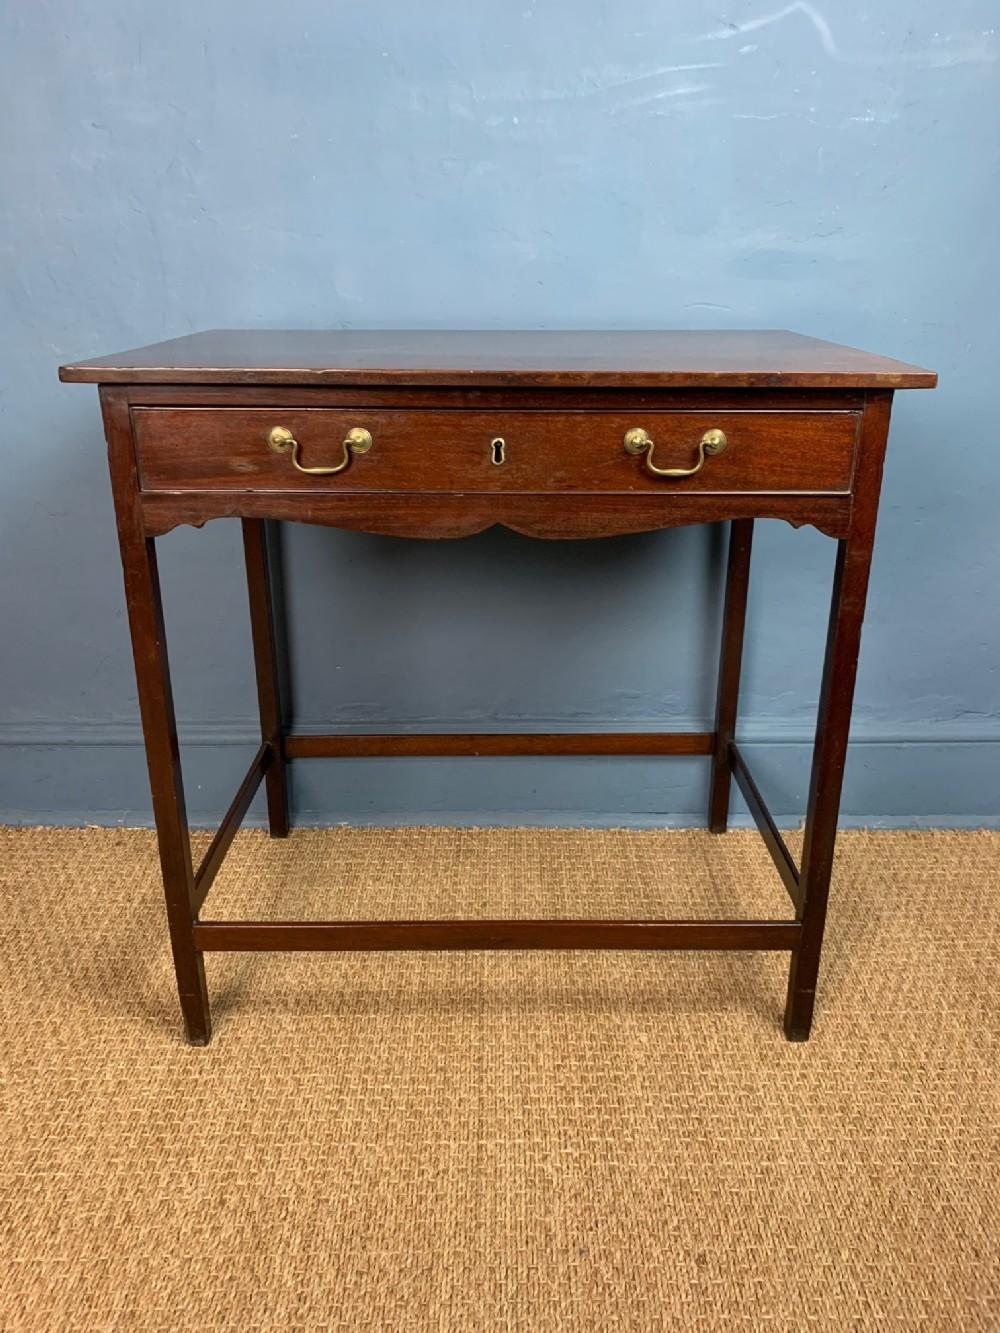 a george 111 mahogany side table circa 1790